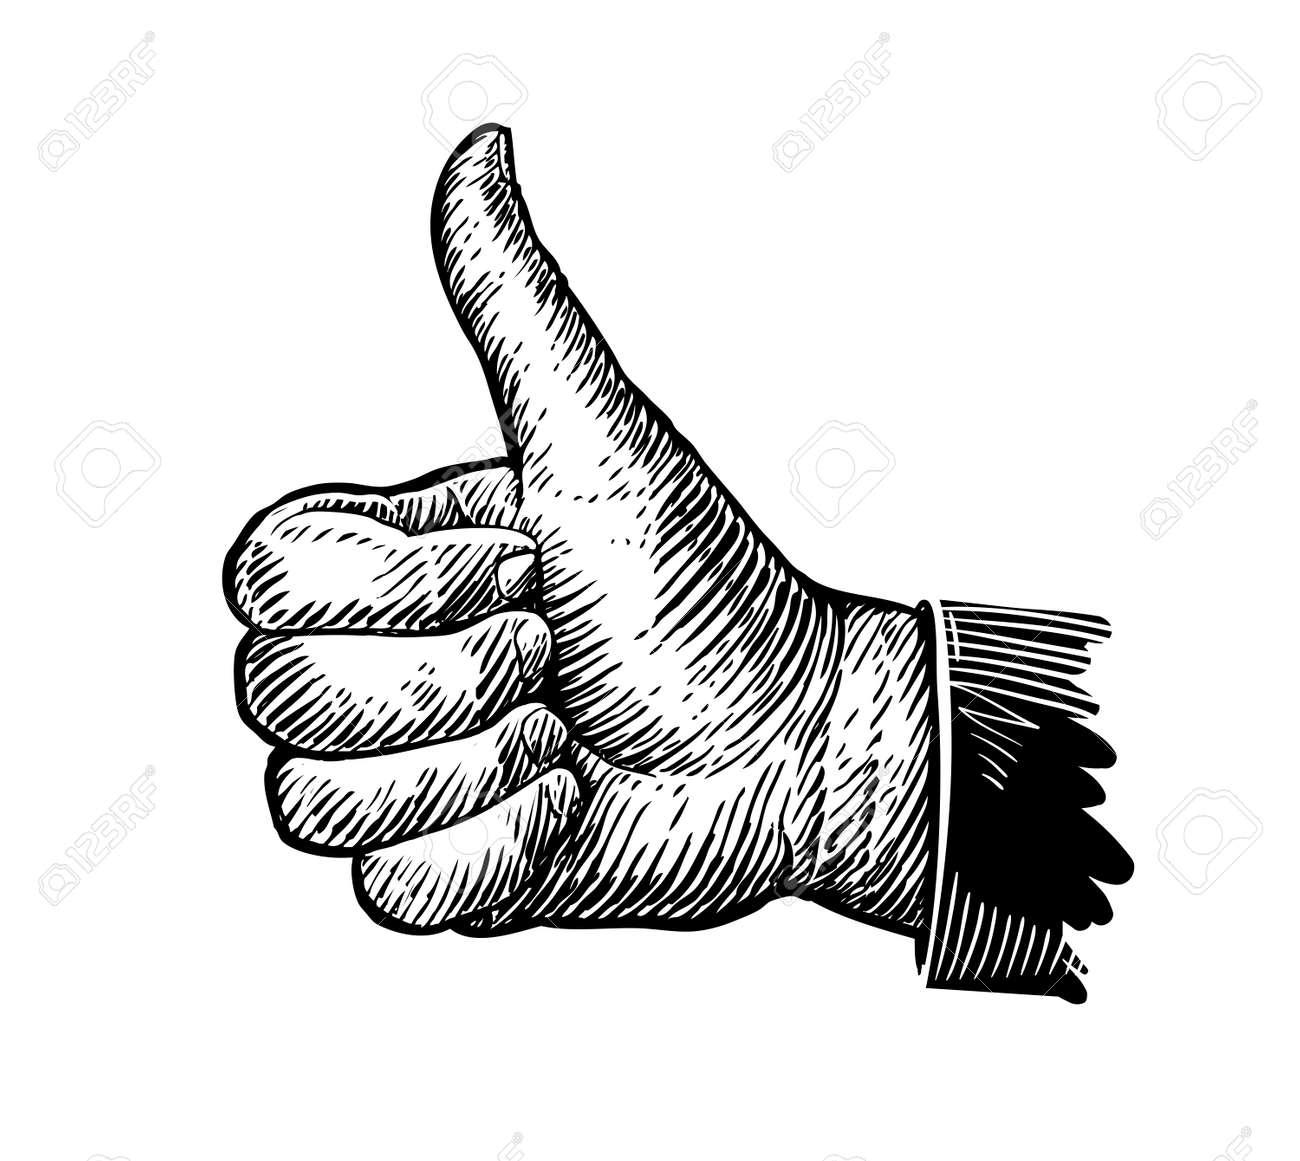 Symbol thumb up. Hand gesture sketch. Vector illustration - 71581144